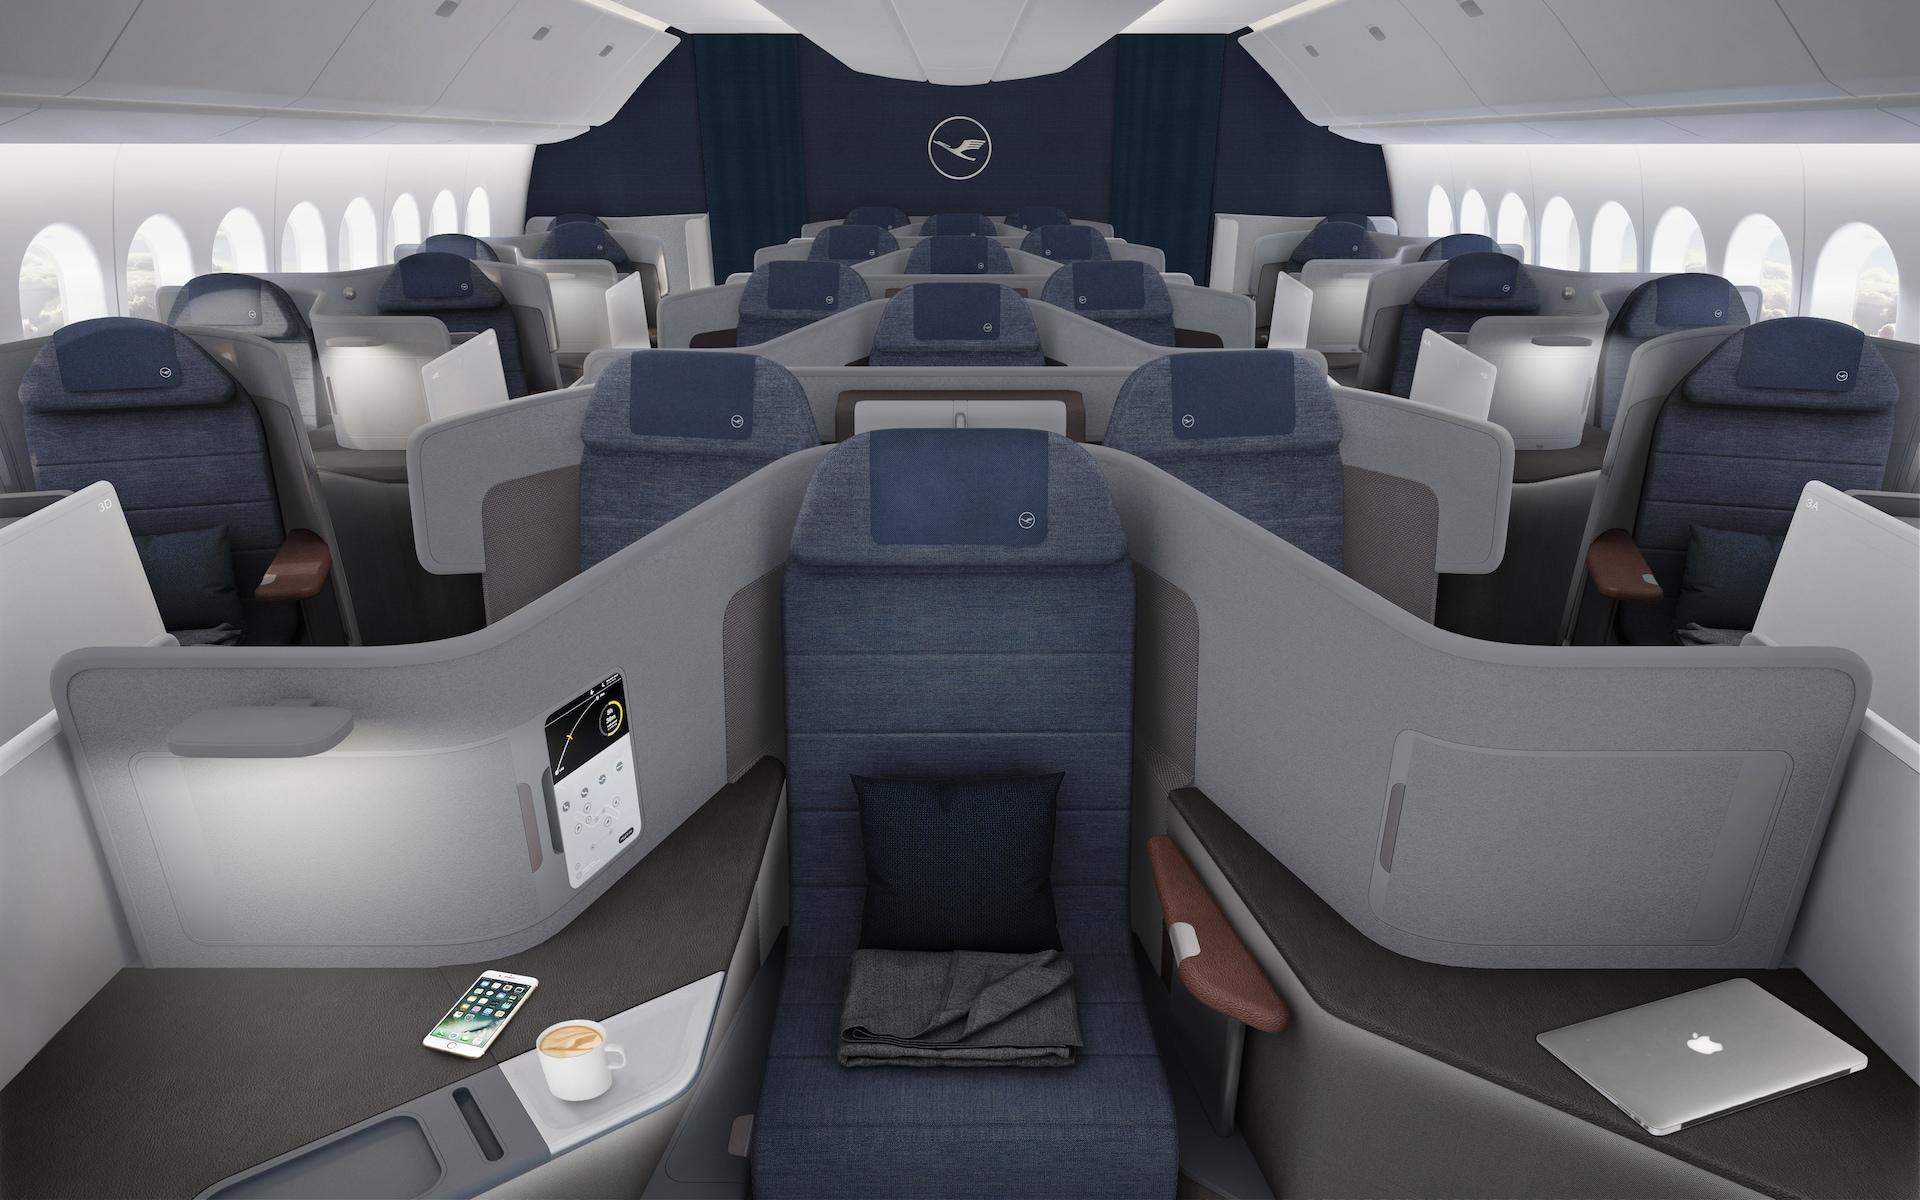 Lufthansa Throne Seat